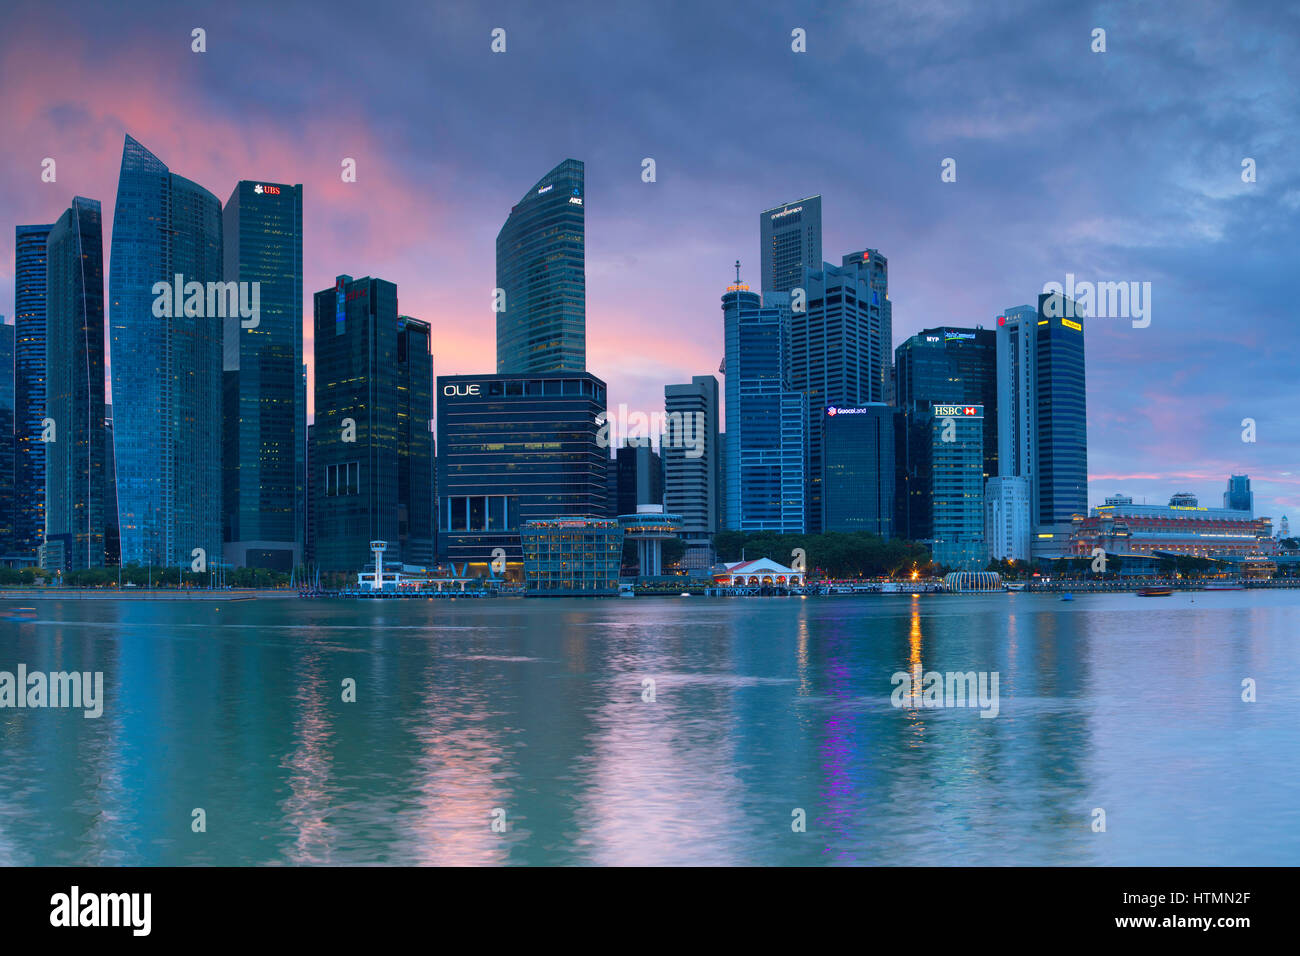 Skyscrapers of CBD at sunset, Marina Bay, Singapore - Stock Image